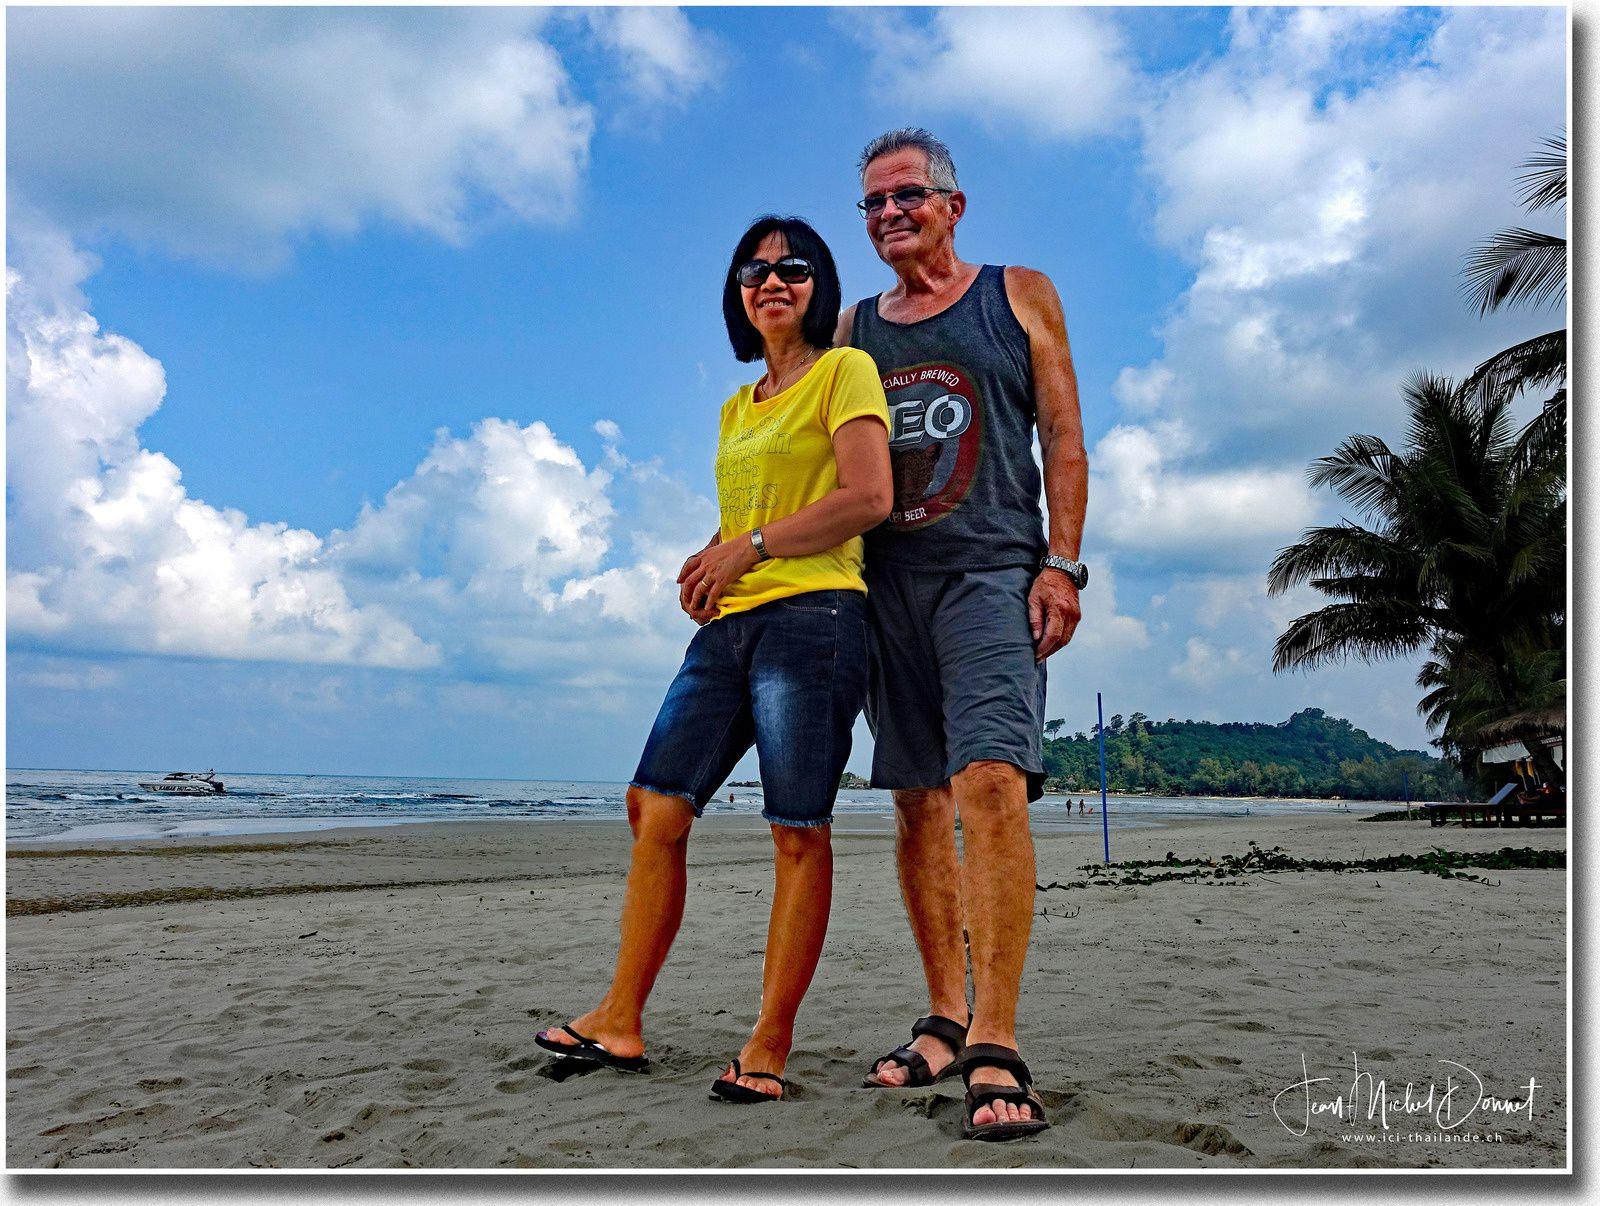 La superbe plage de Klong Prao (Ko Chang)